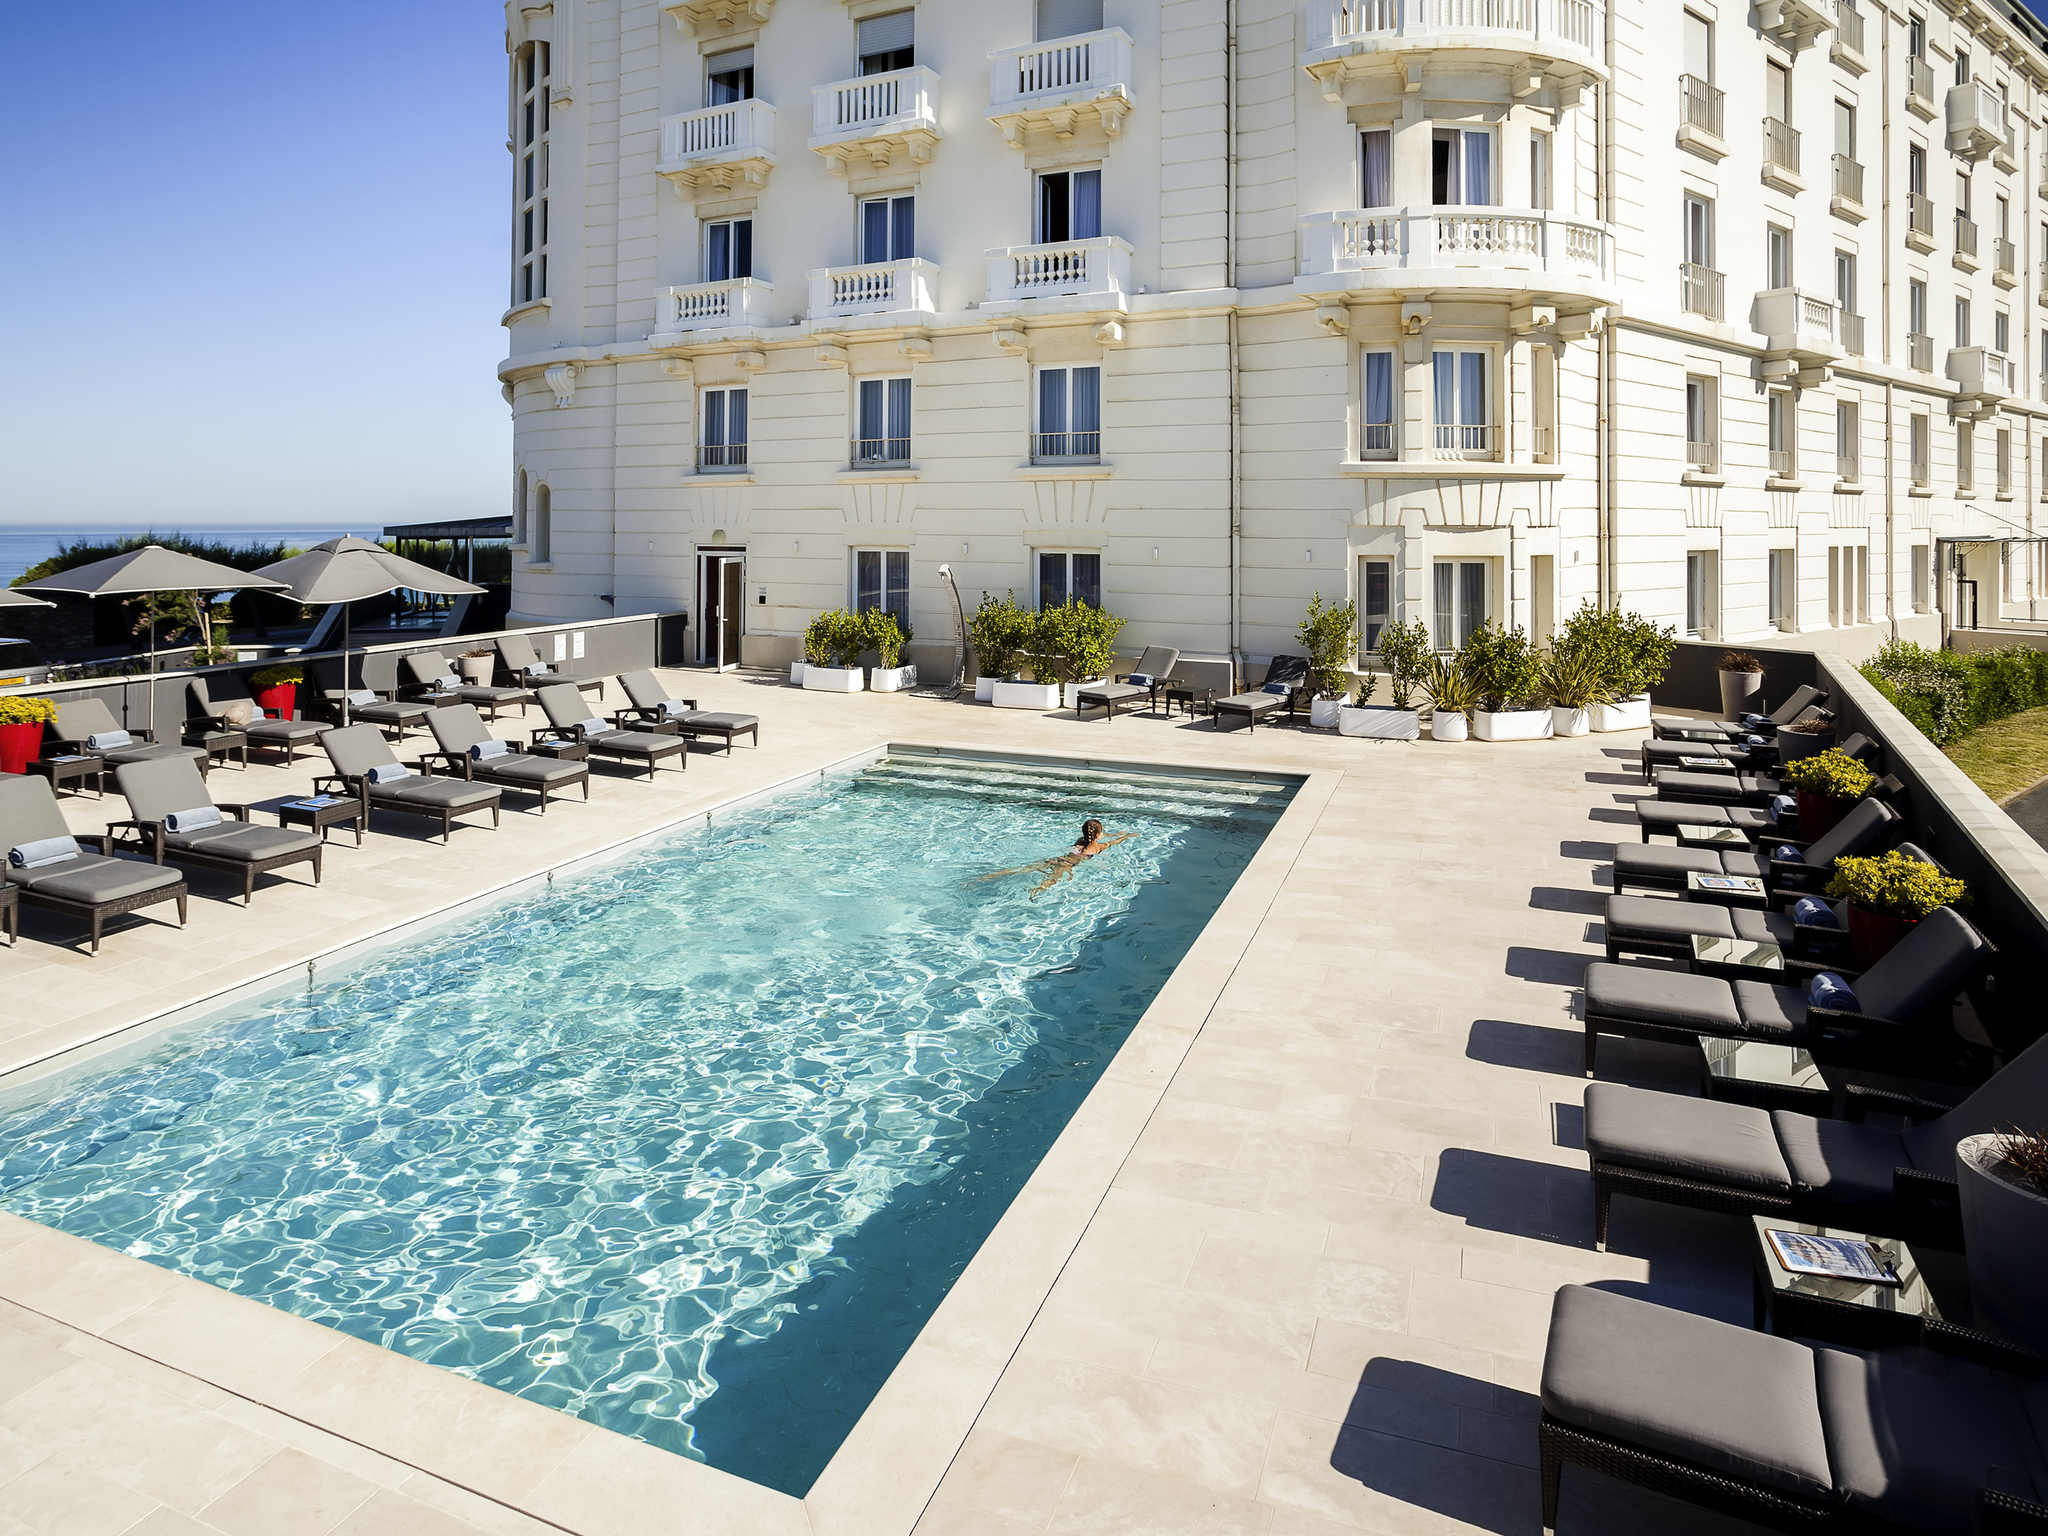 فندق - Le Régina Biarritz Hôtel & Spa - MGallery by Sofitel